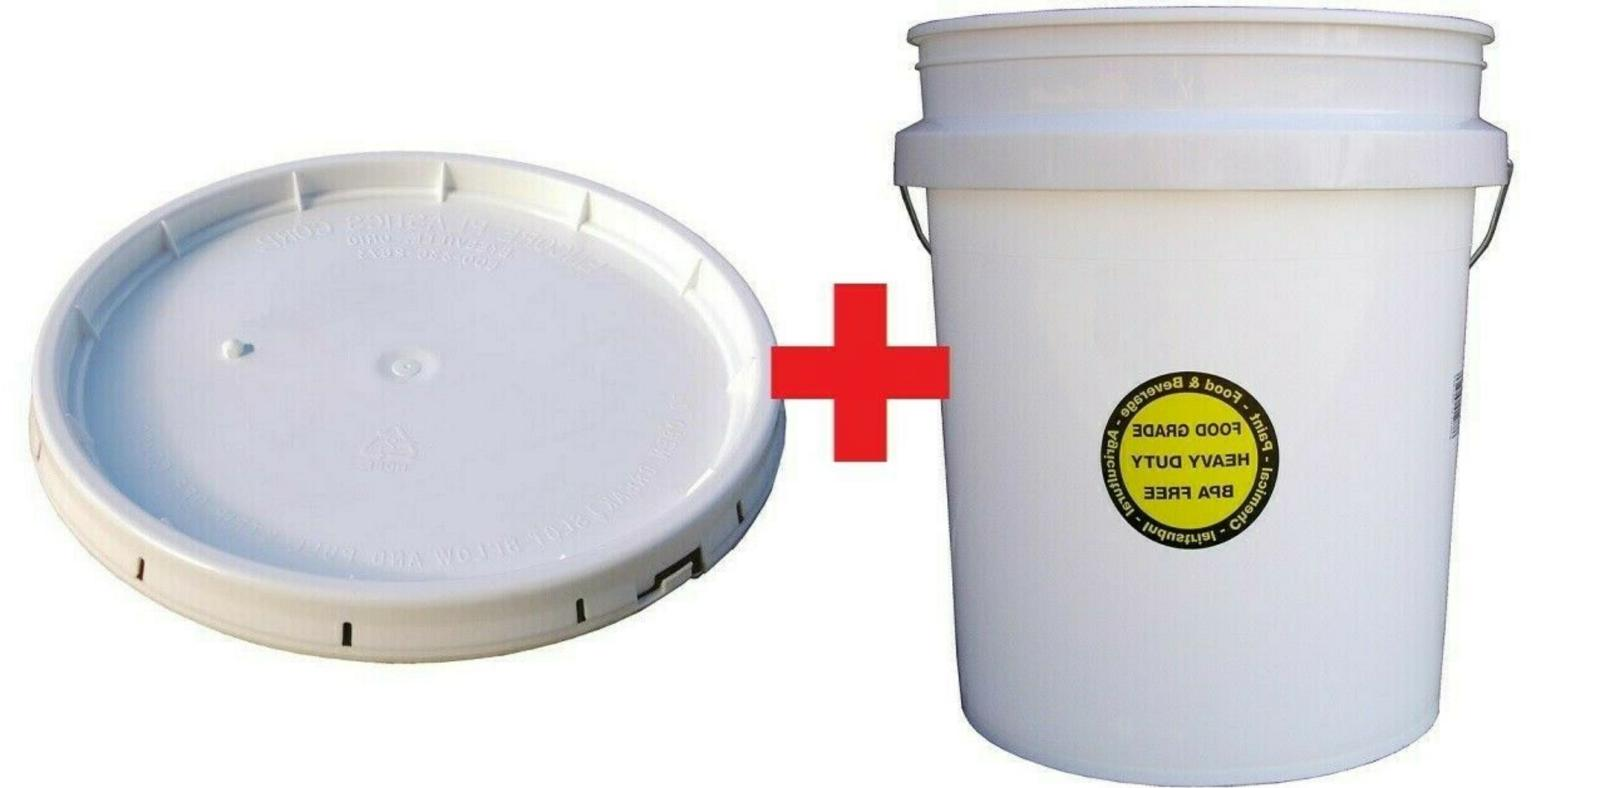 Encore Plastics 5-Gallon All Purpose Durable Commercial Food